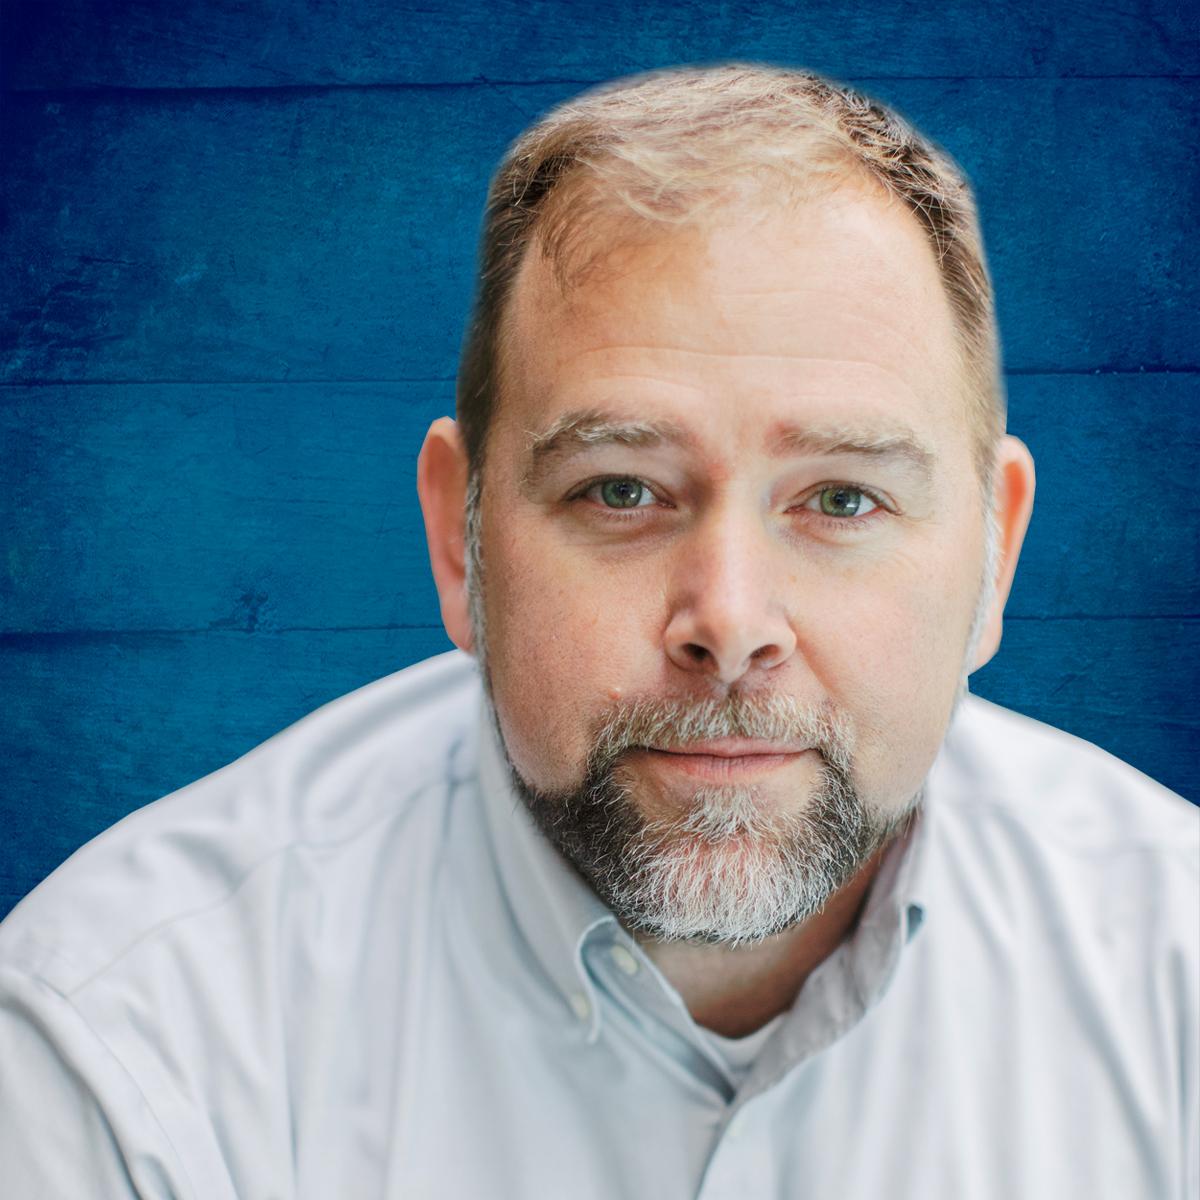 Jarrod Potteiger - Director of Services and Sr. Technical Consultant, Des-Case Corporation